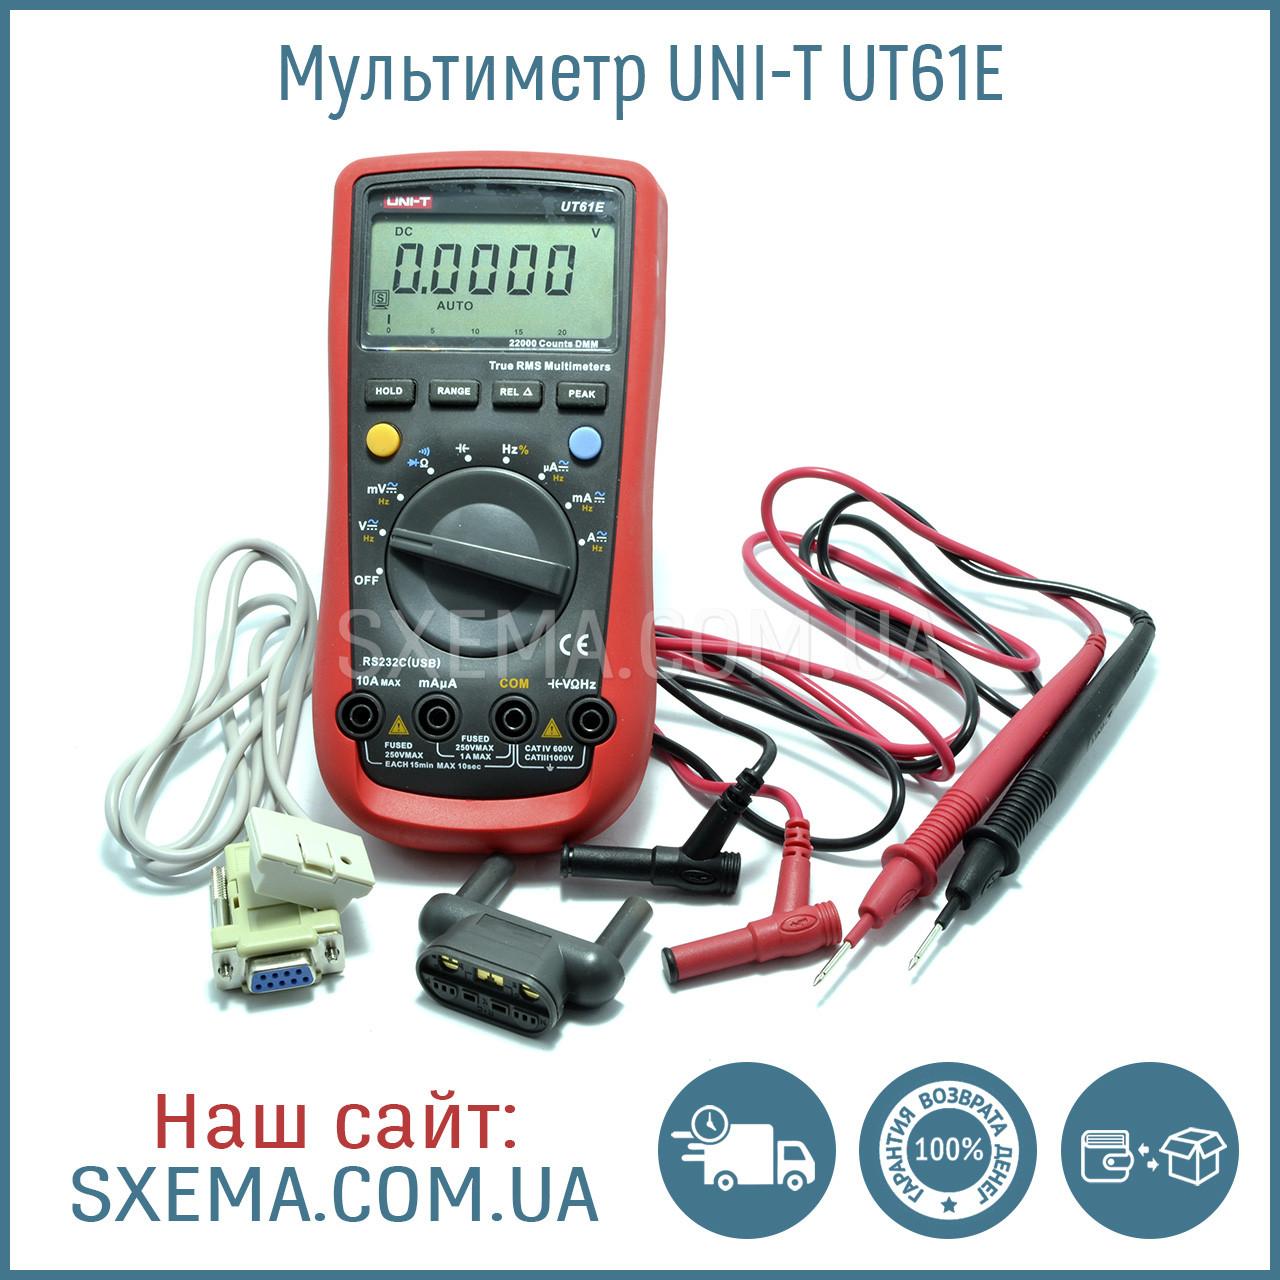 Цифровой мультиметр UNI-T UT-61E